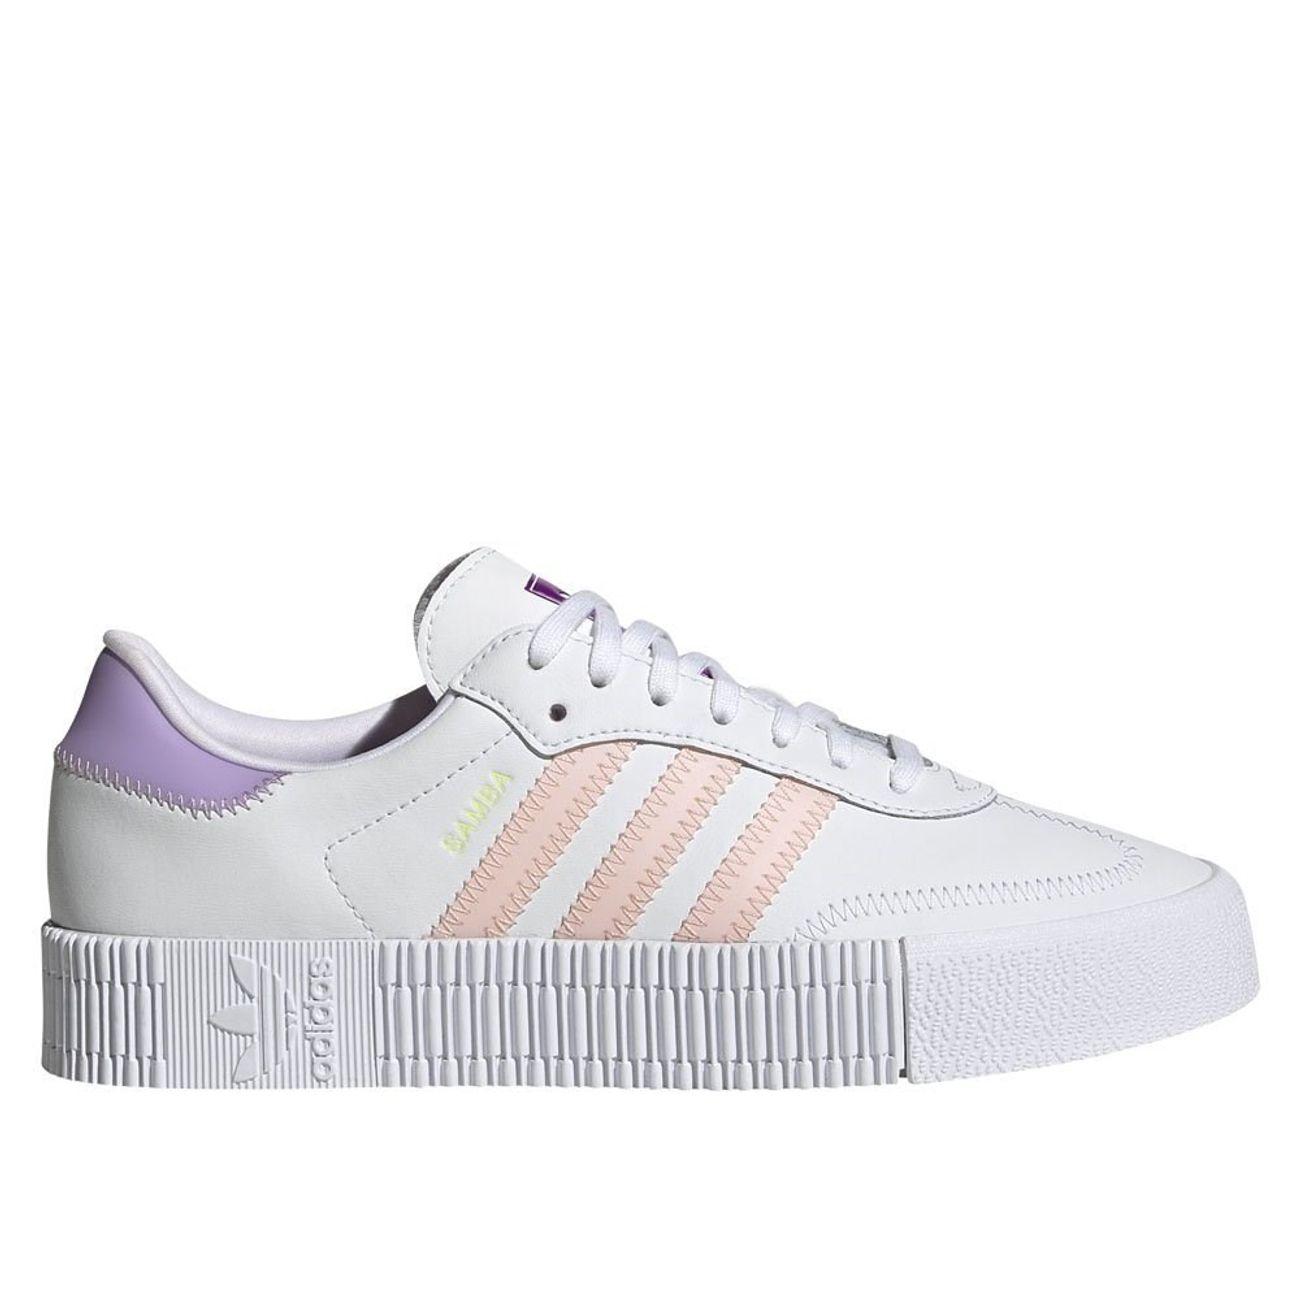 Adidas Sambarose W – achat pas cher - GO Sport